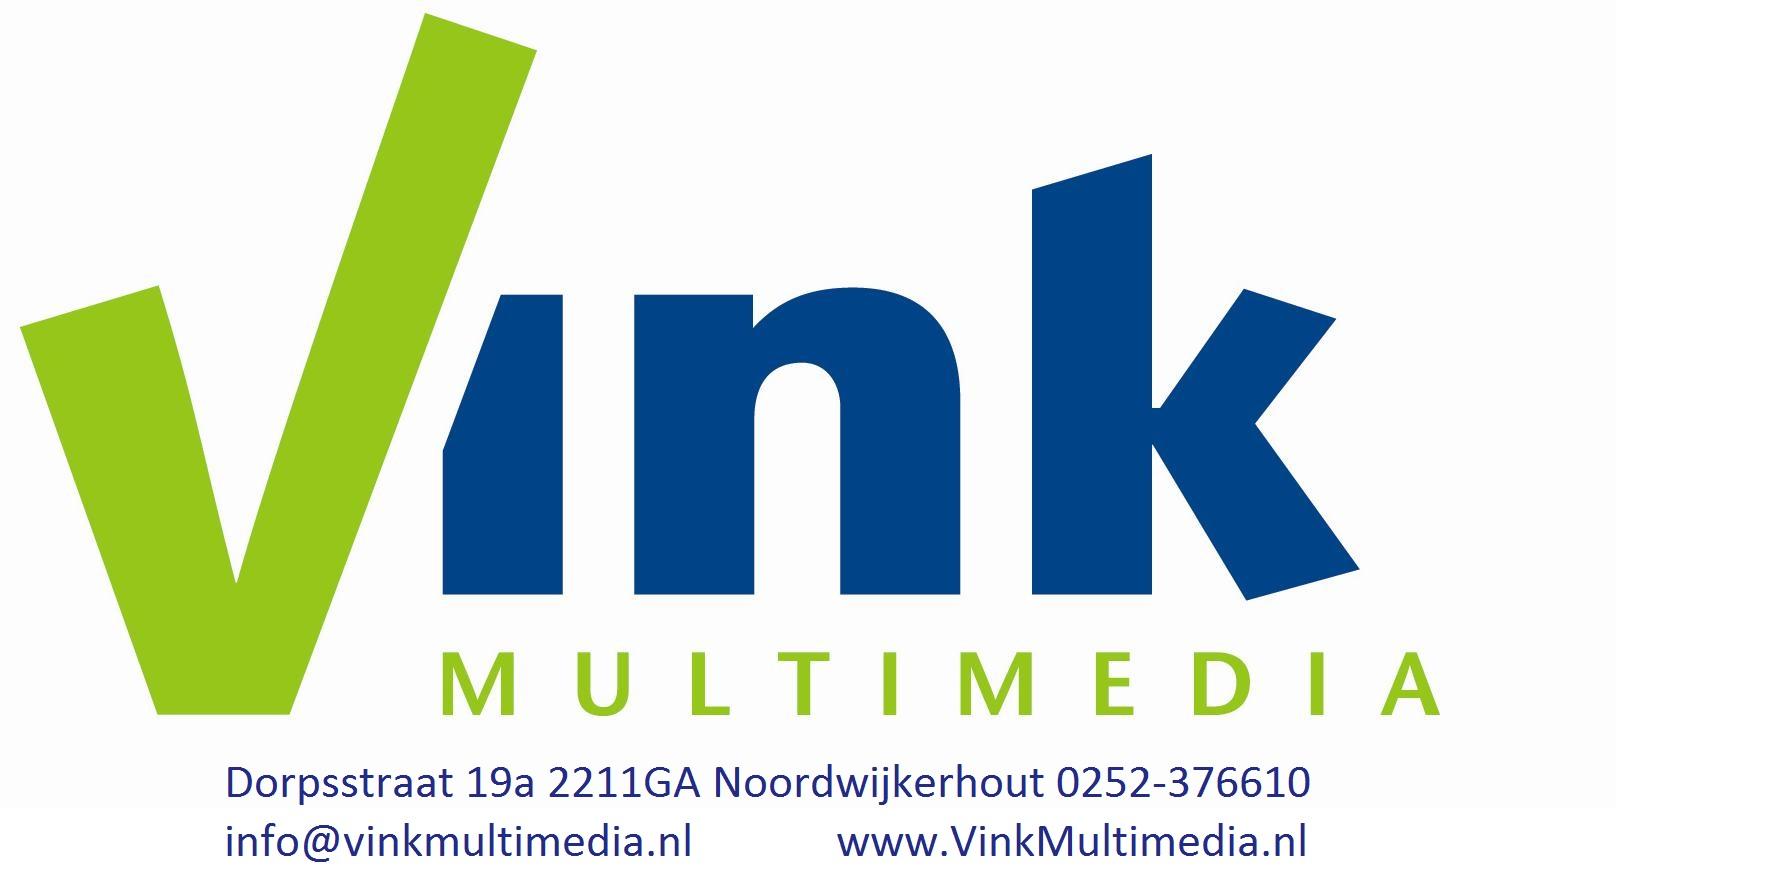 Vink multimedia